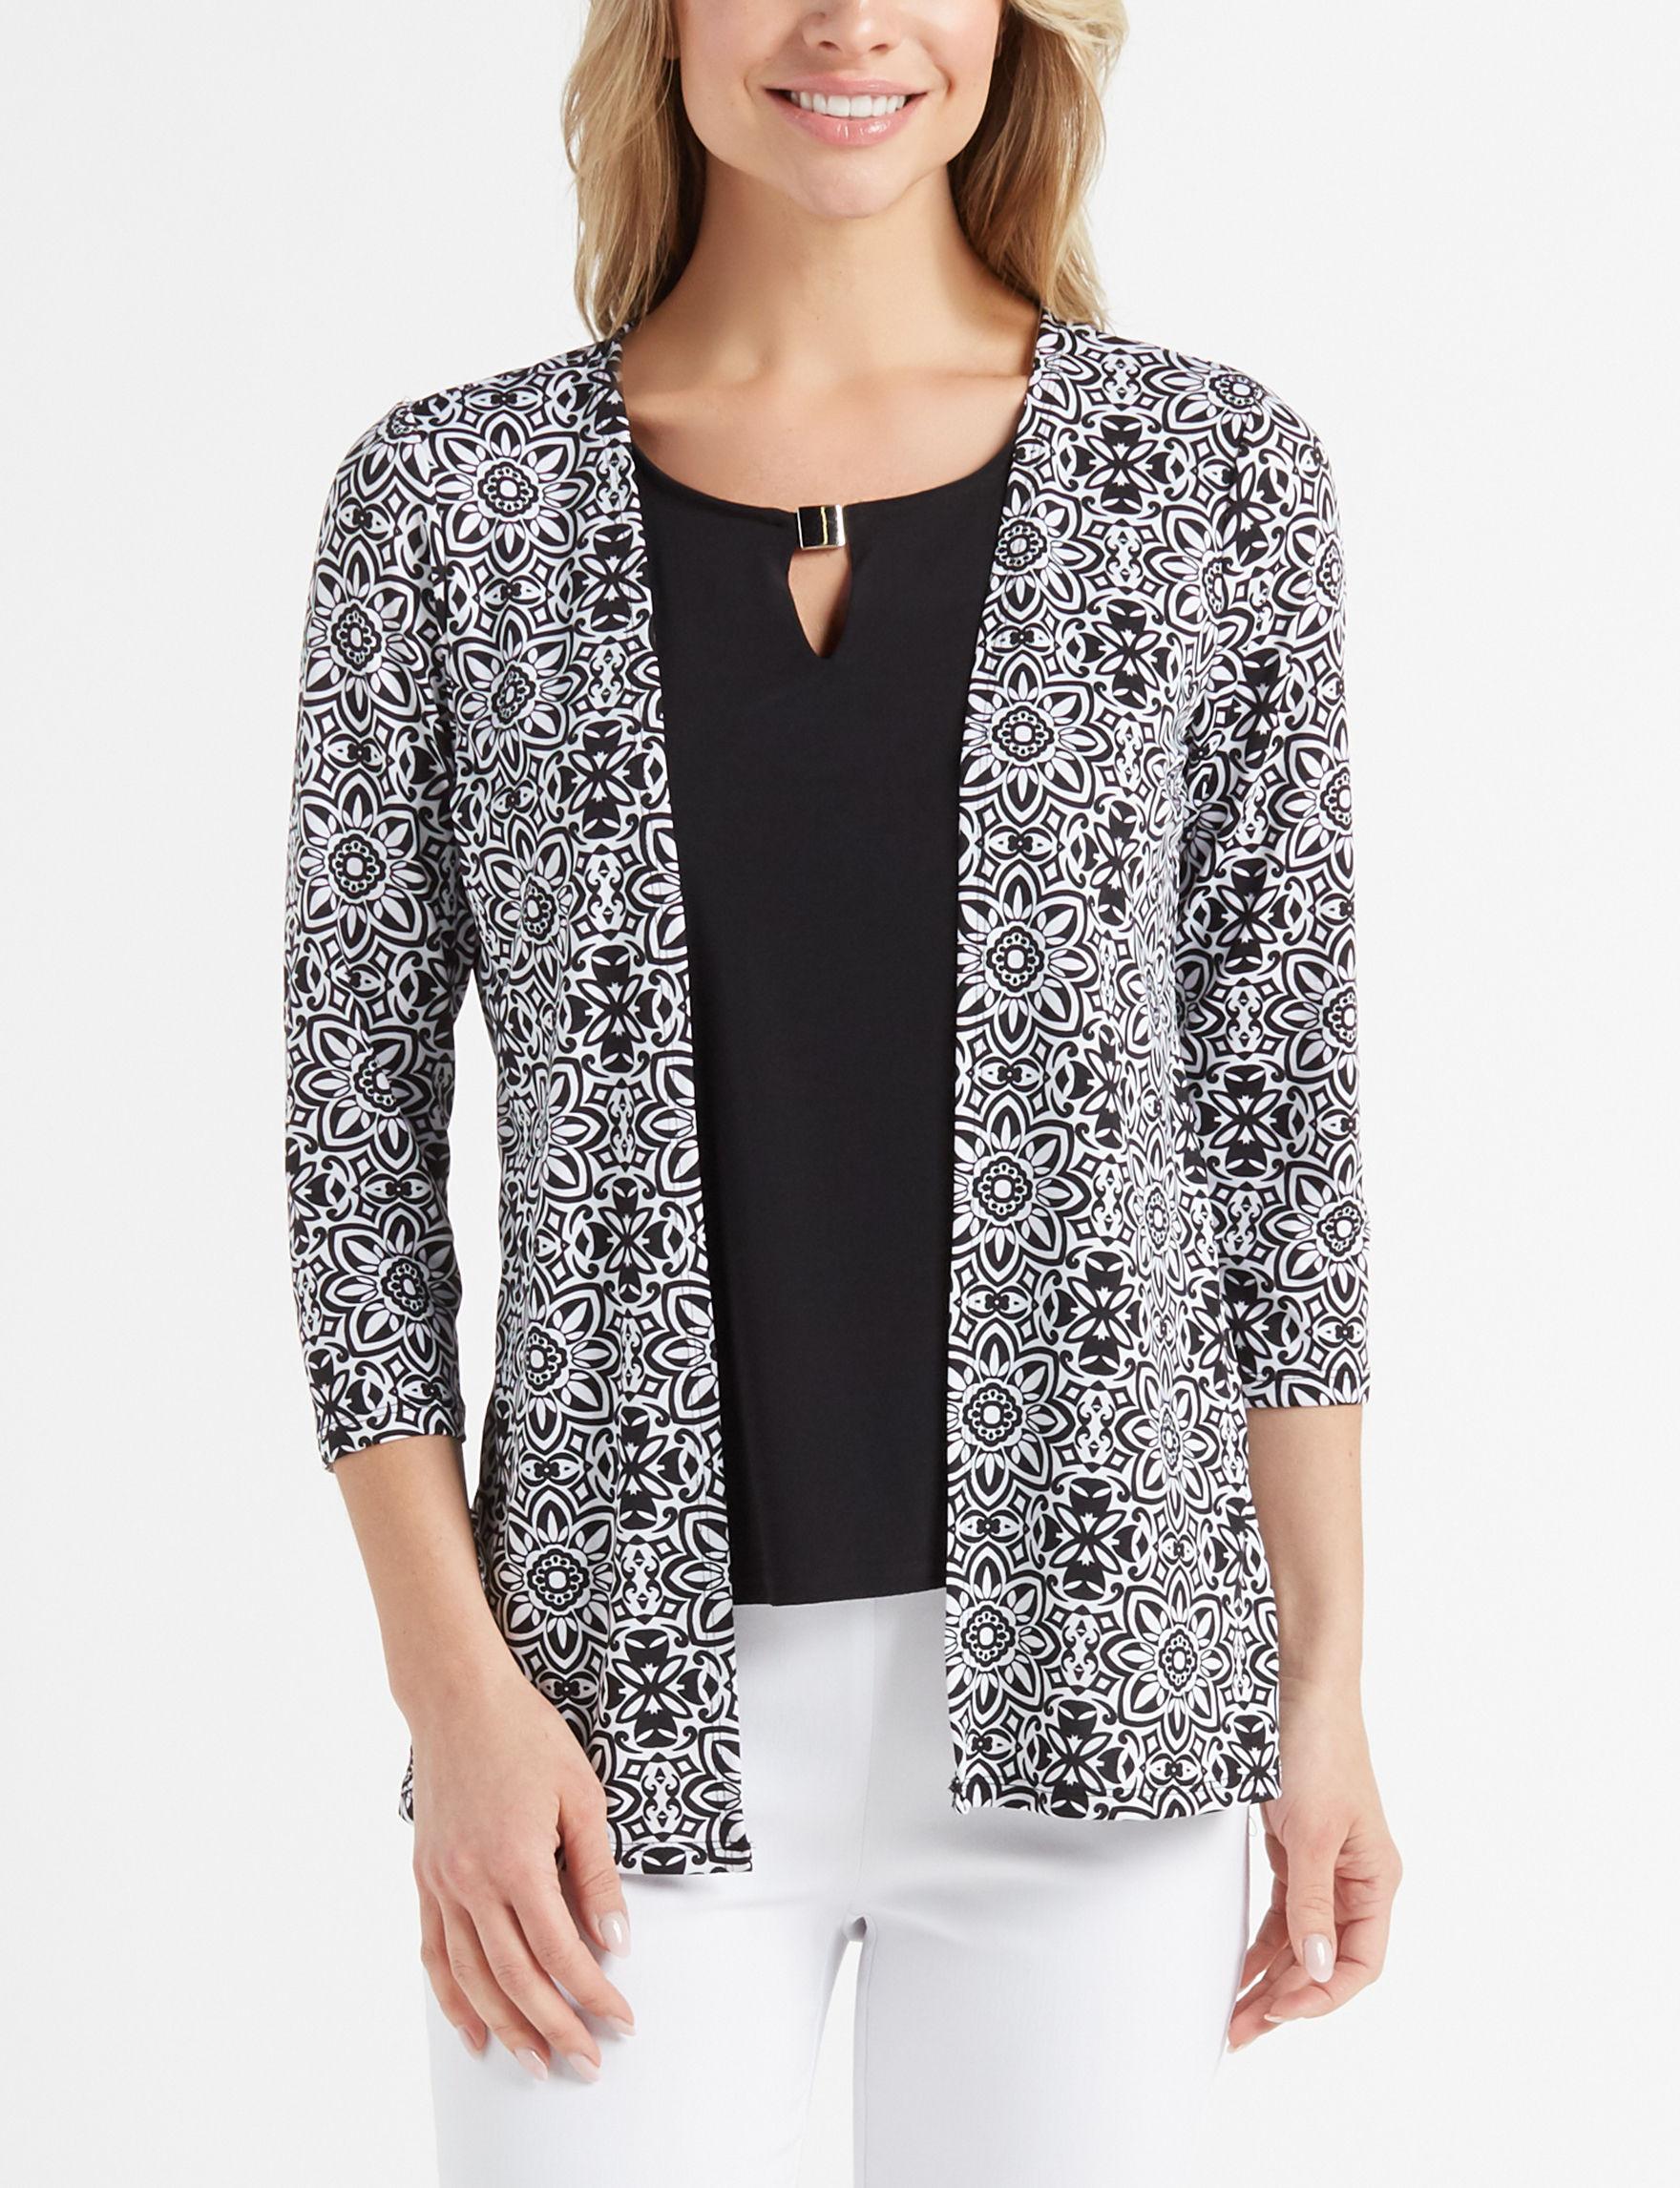 Rebecca Malone Black White Shirts & Blouses